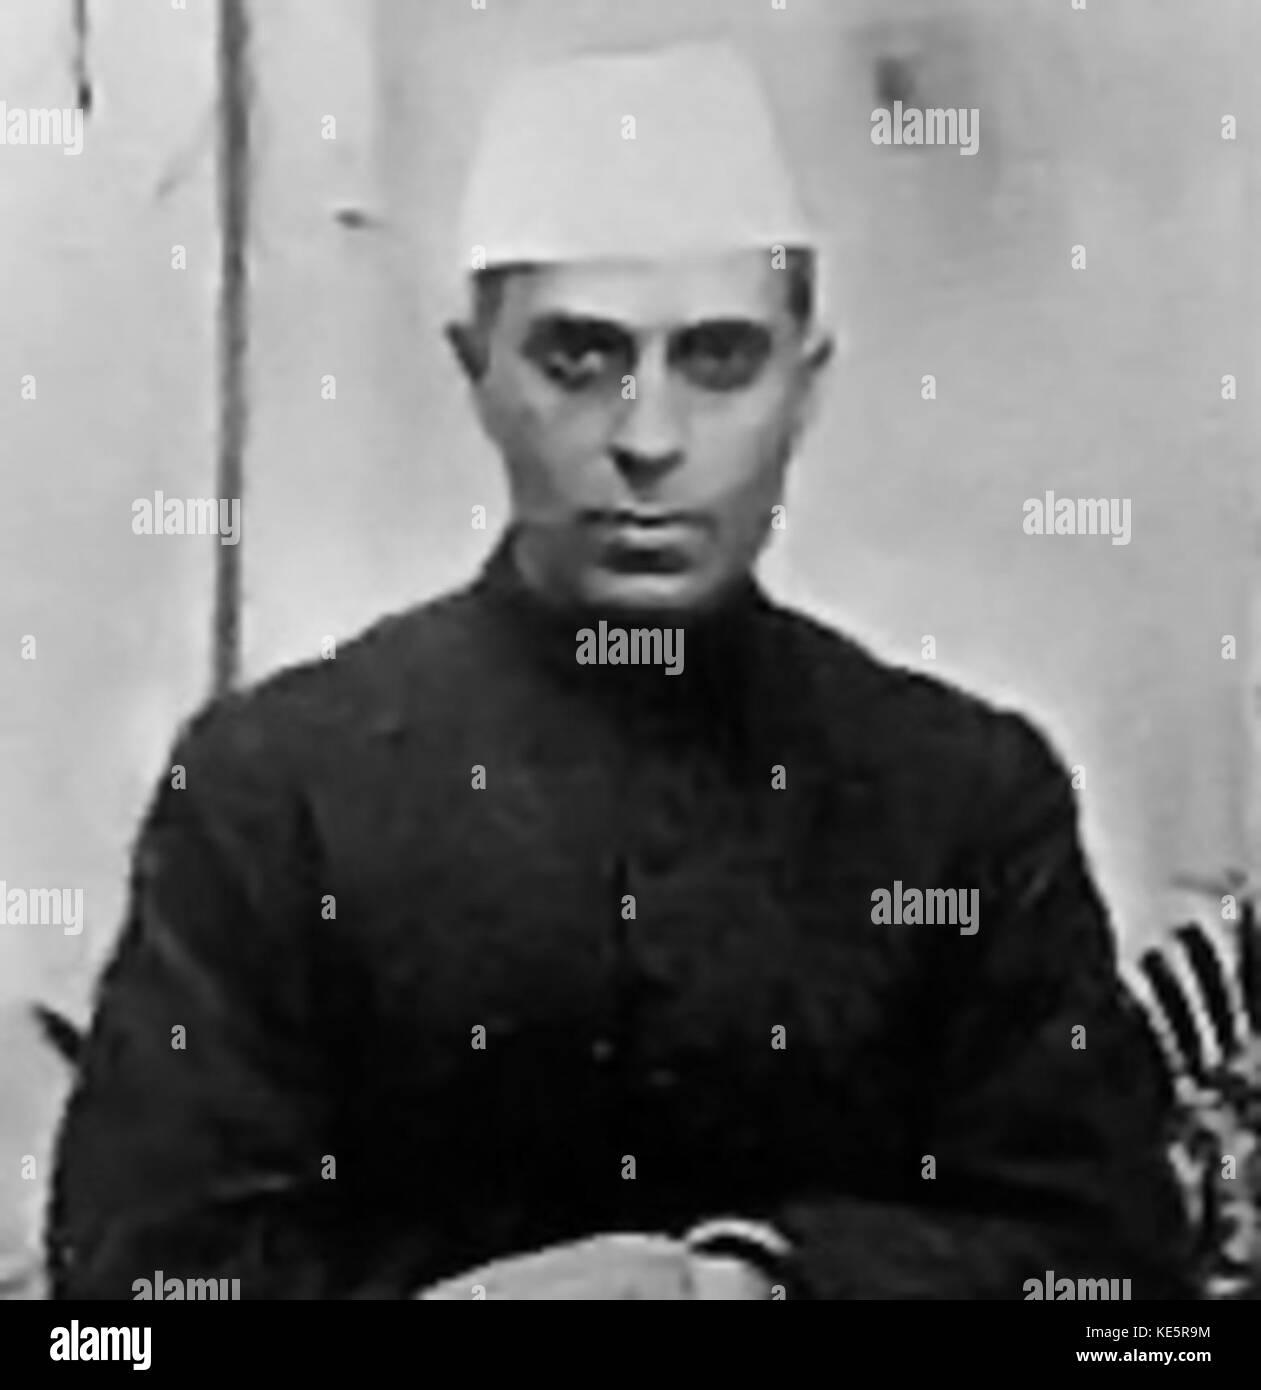 Jawaharlal Nehru - Stock Image